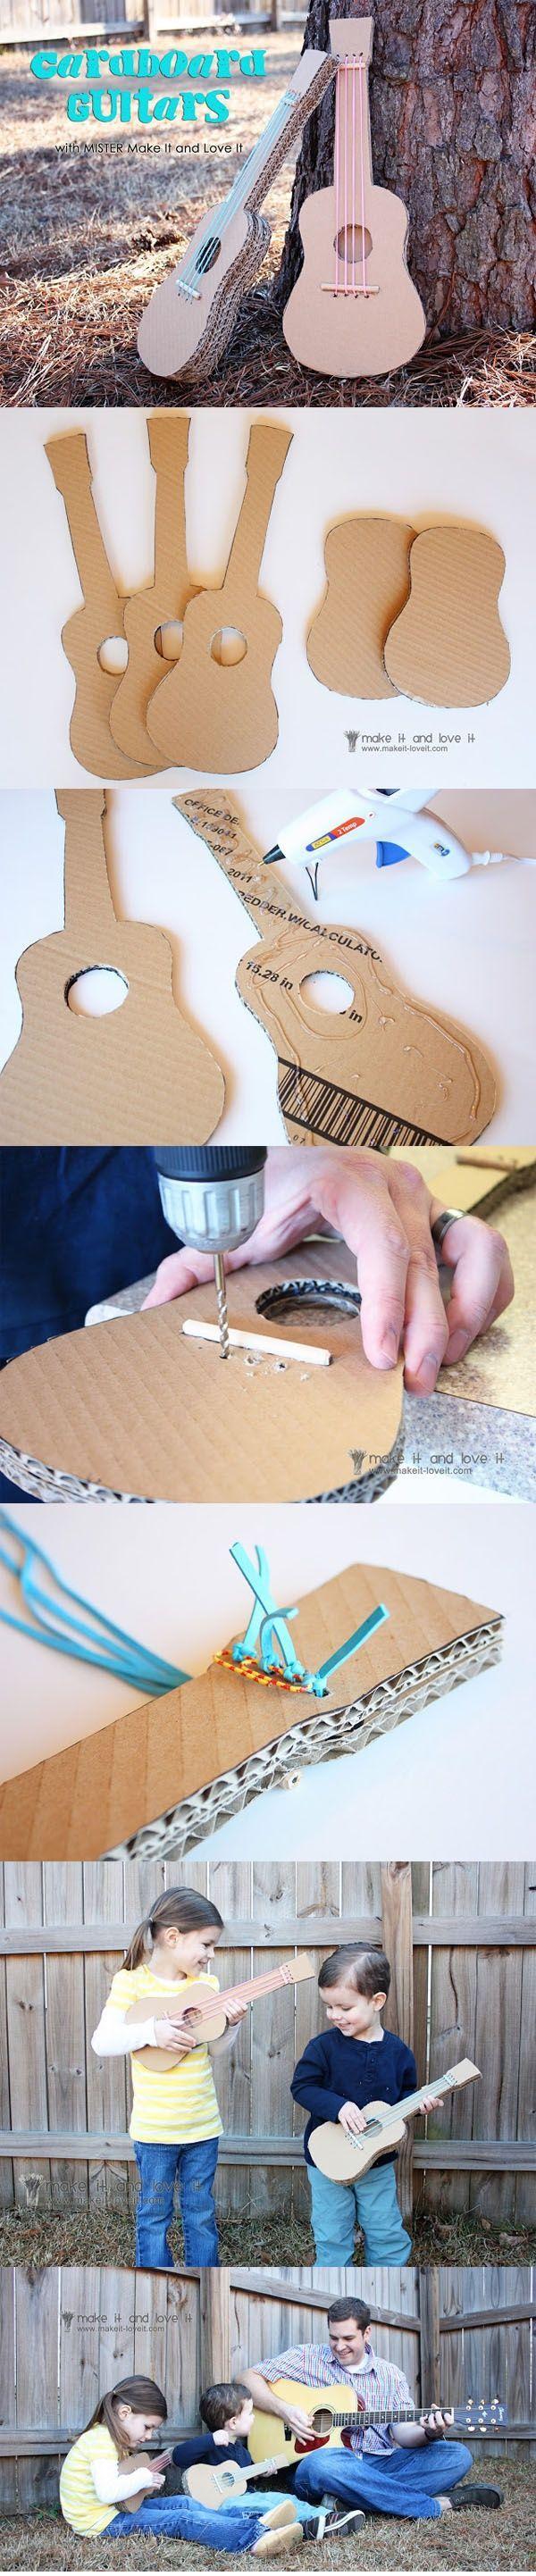 Ingeniosas+guitarras+de+cartón:                                                                                                                                                                                 Más